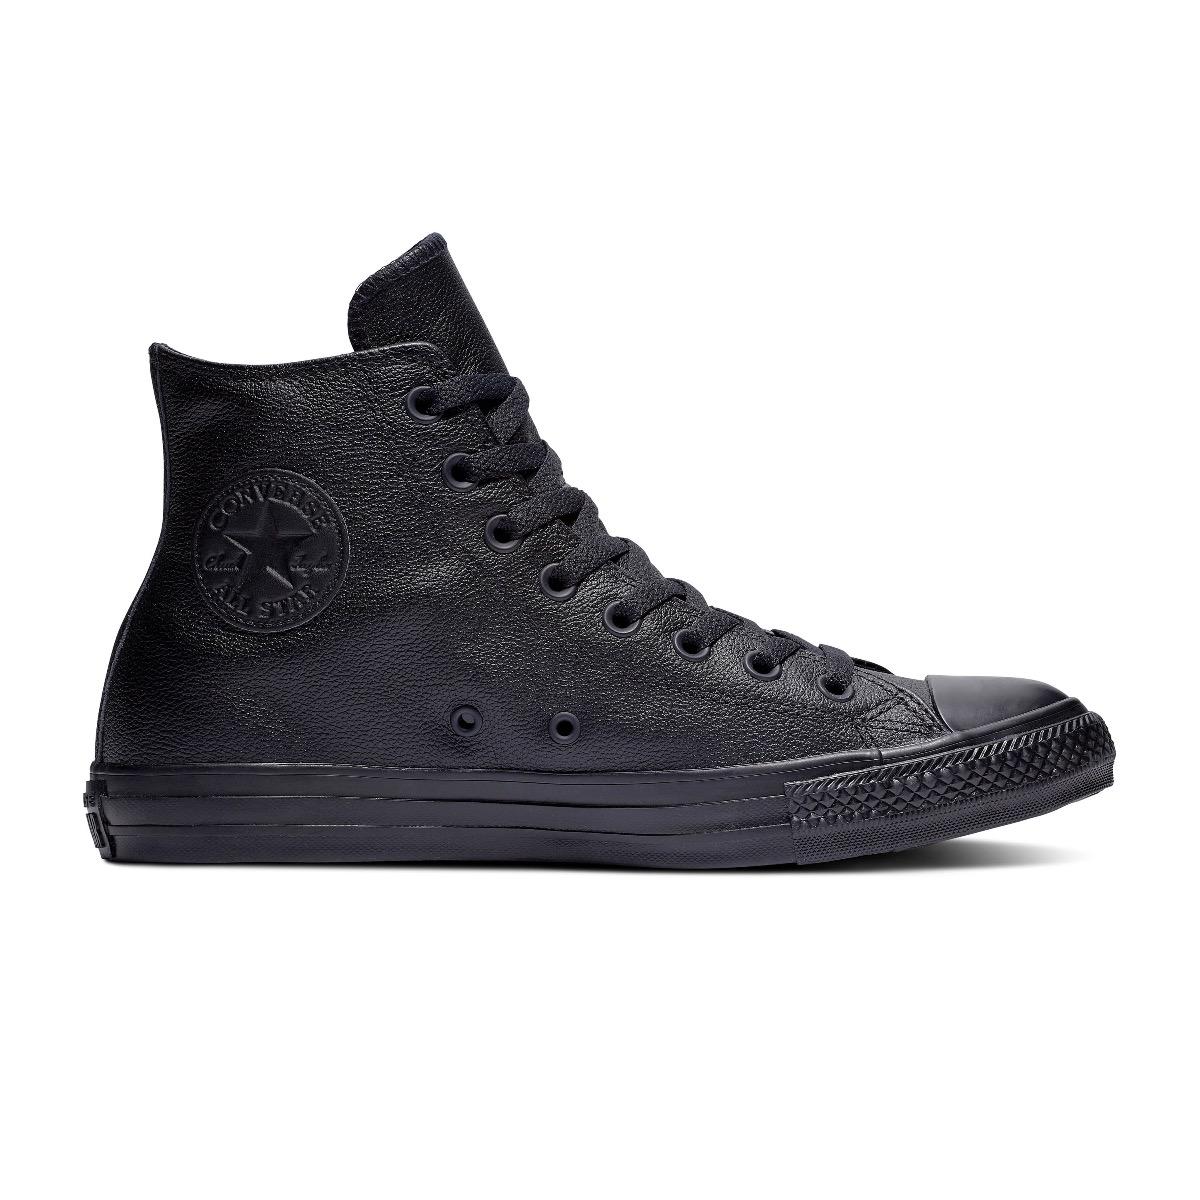 Converse All Stars Leather Hoog 135251C Zwart-36 maat 36